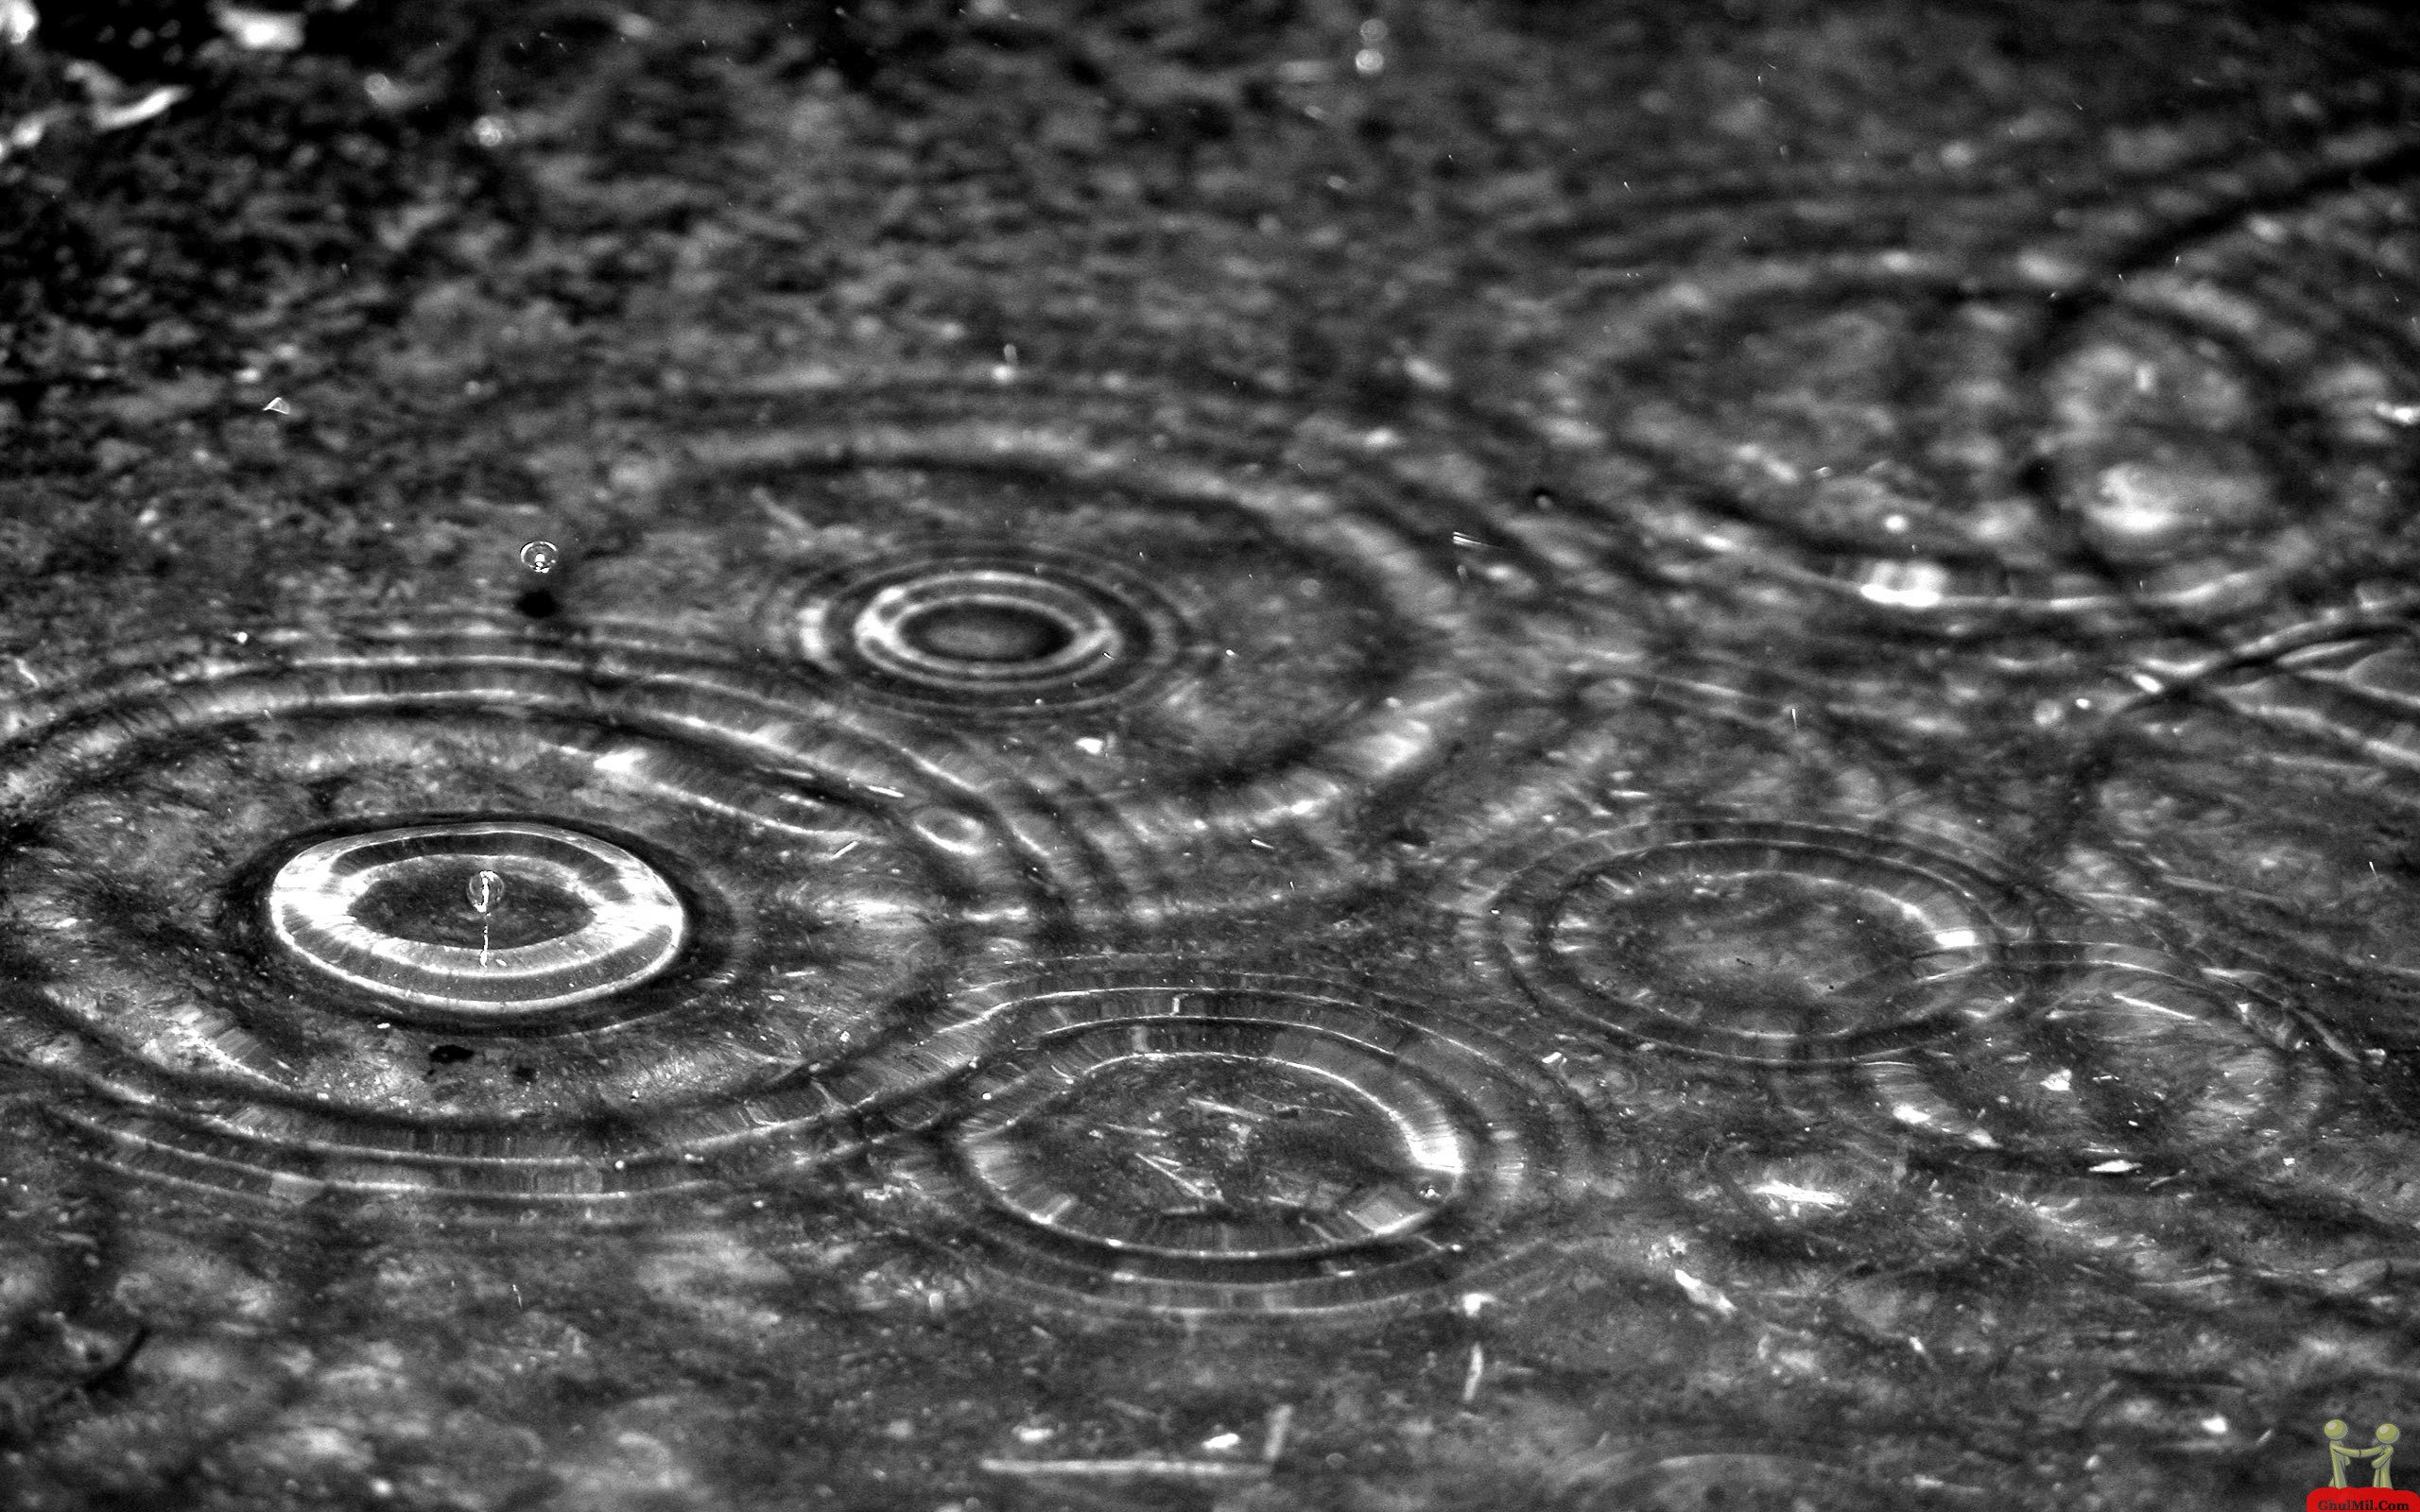 Falling Rain Drops HD Wallpaper HD Wallpapers Download 2560x1600